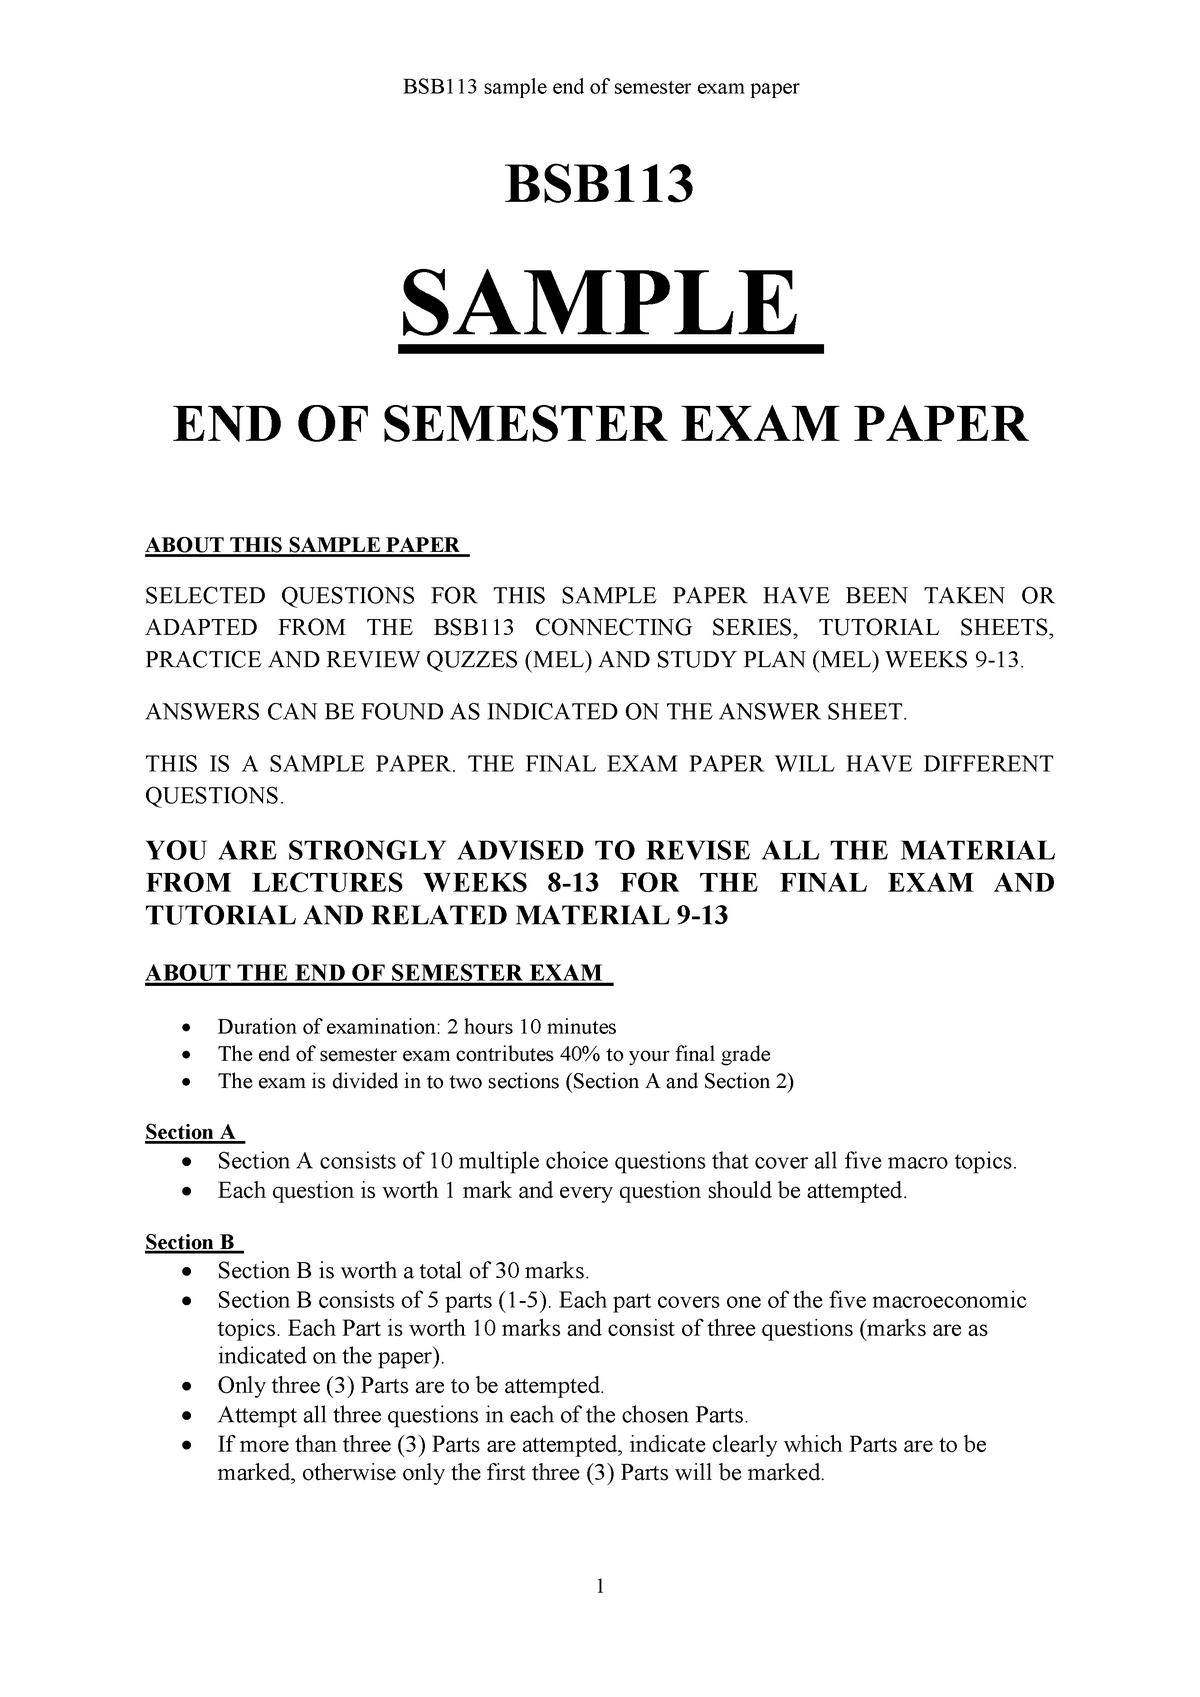 BSB113 Sample paper end of semester exam 2019 - Economics ...